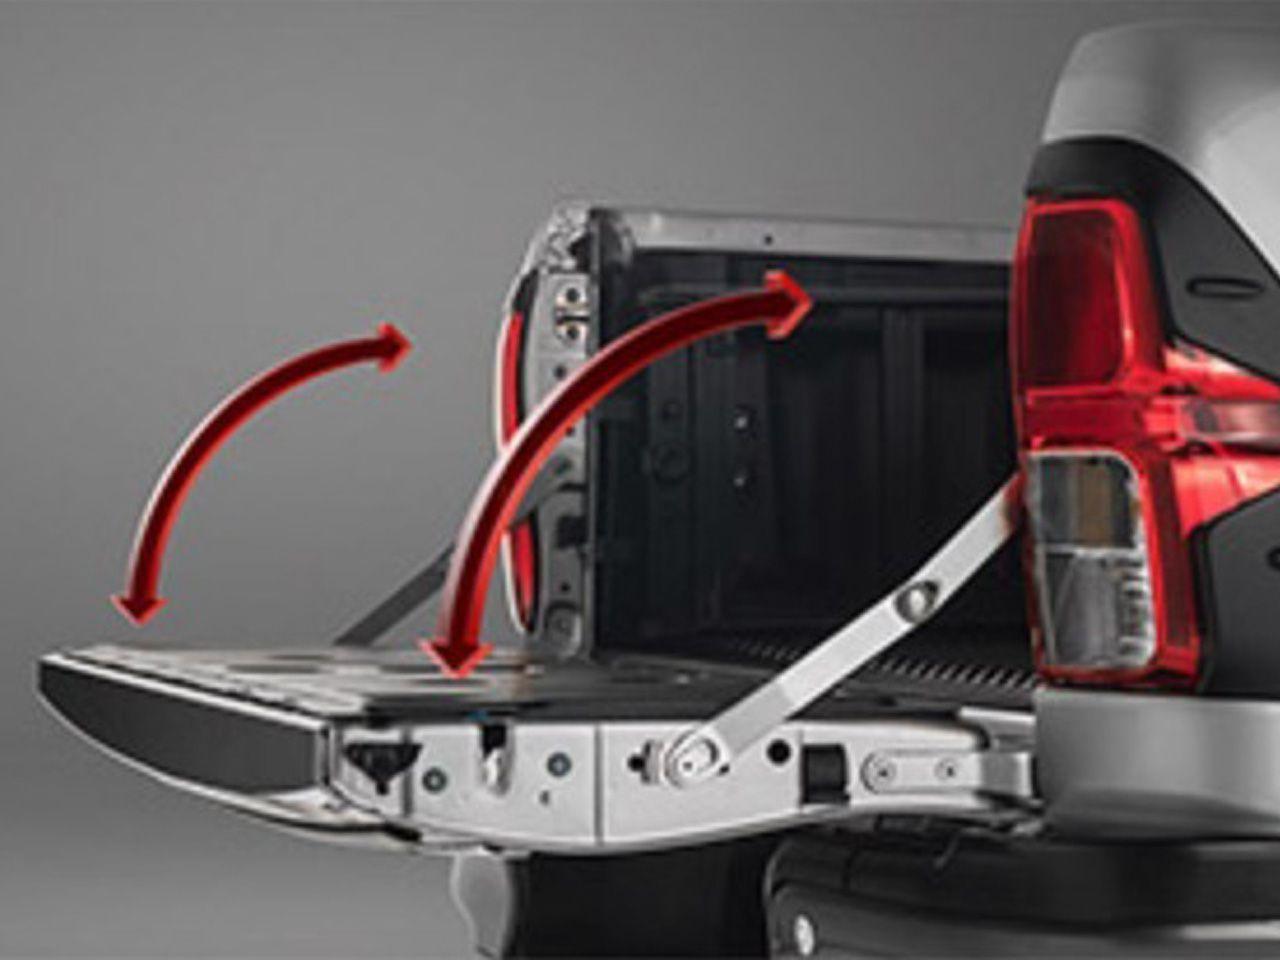 Assistente de Abertura de Caçamba Hilux STD SR SRV SRX Chassi Cabine Simples  - Mirai Peças Toyota